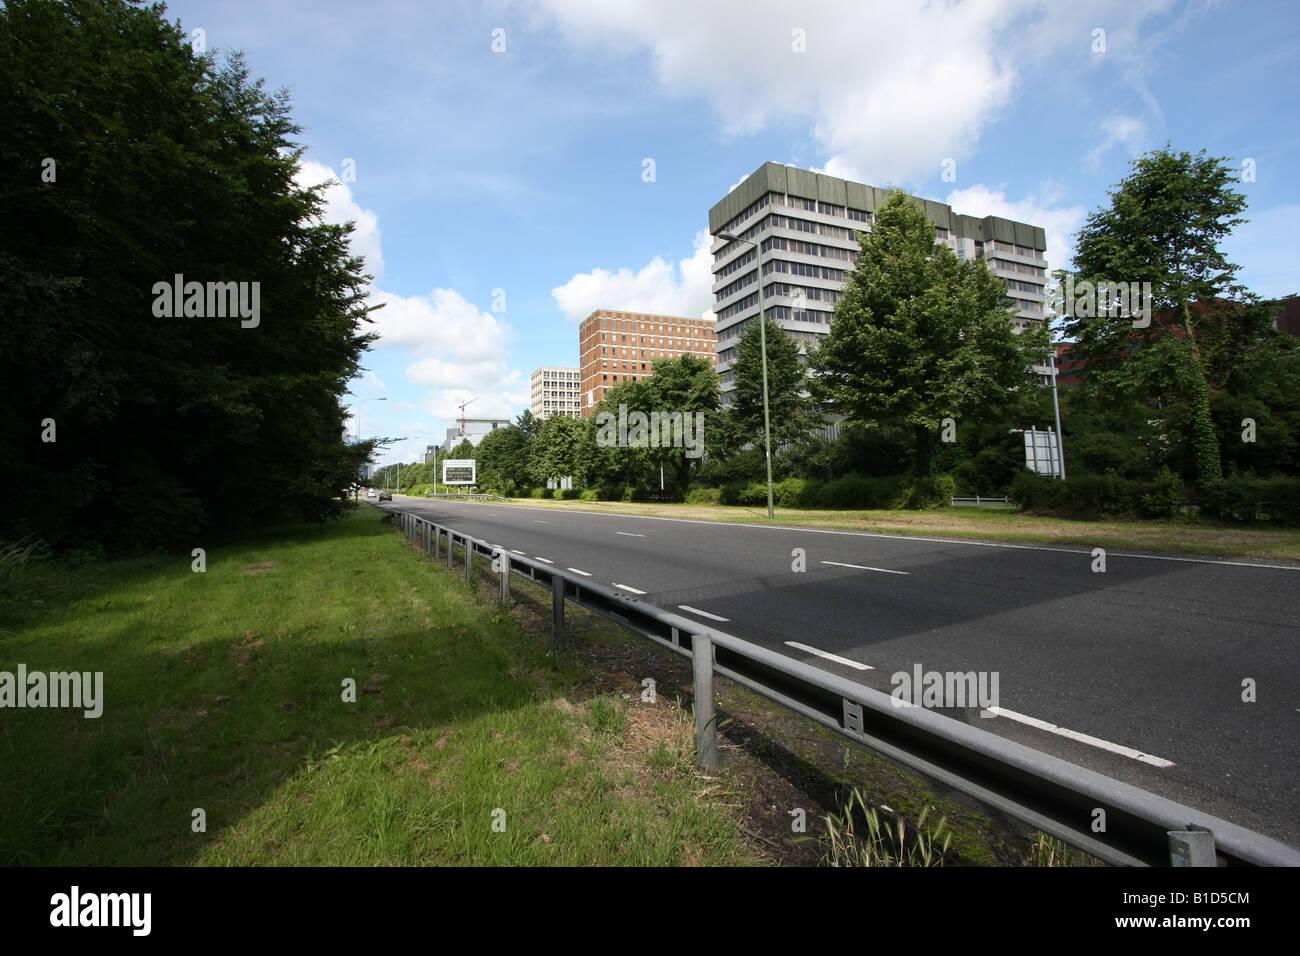 Landscape basingstoke : Dual carriageway with office buildings basingstoke hampshire landscape